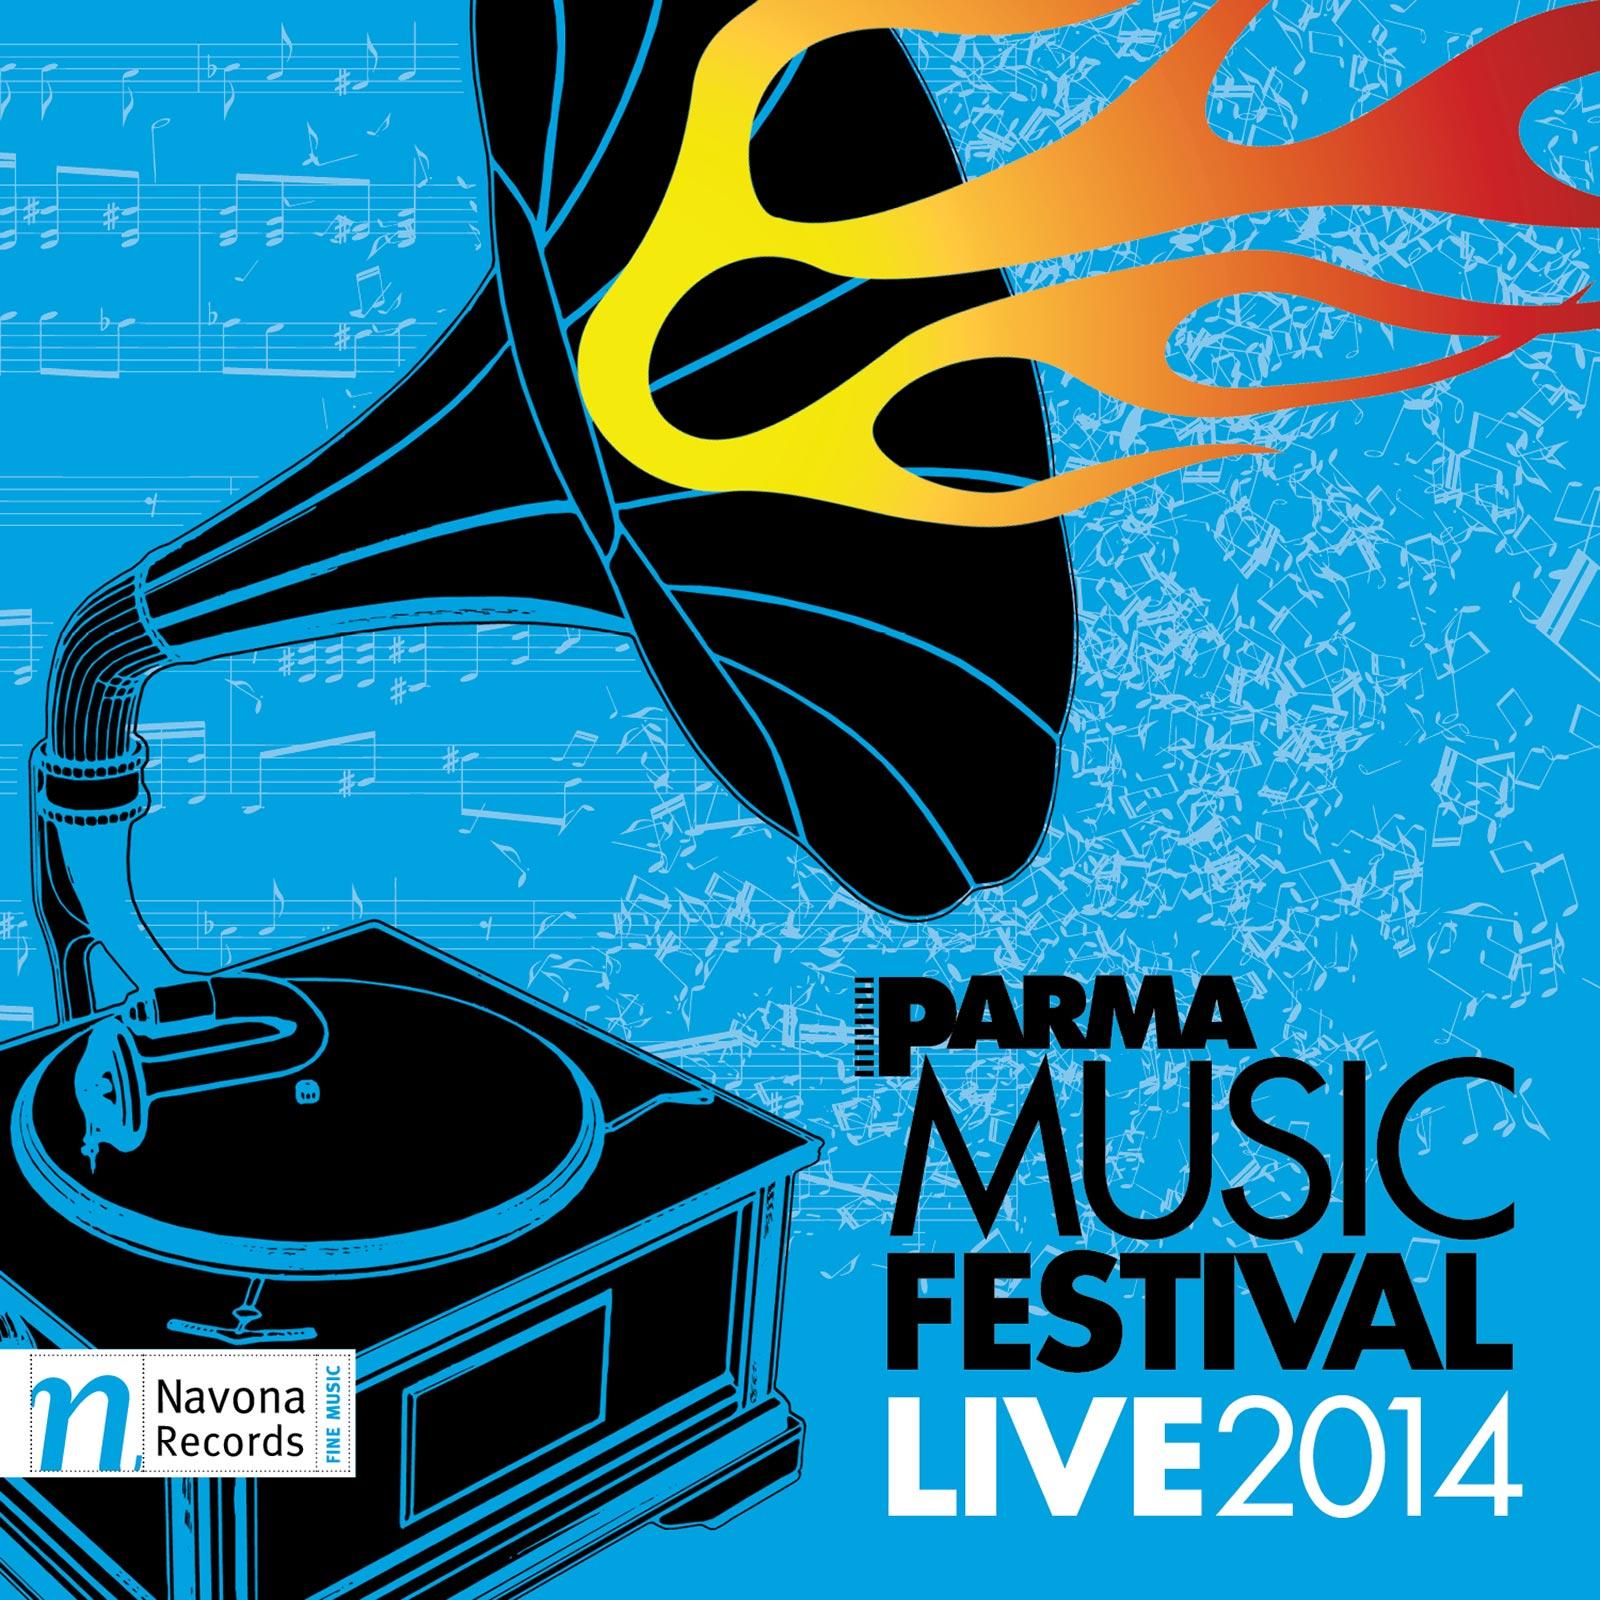 PARMA Music Festival Live 2014